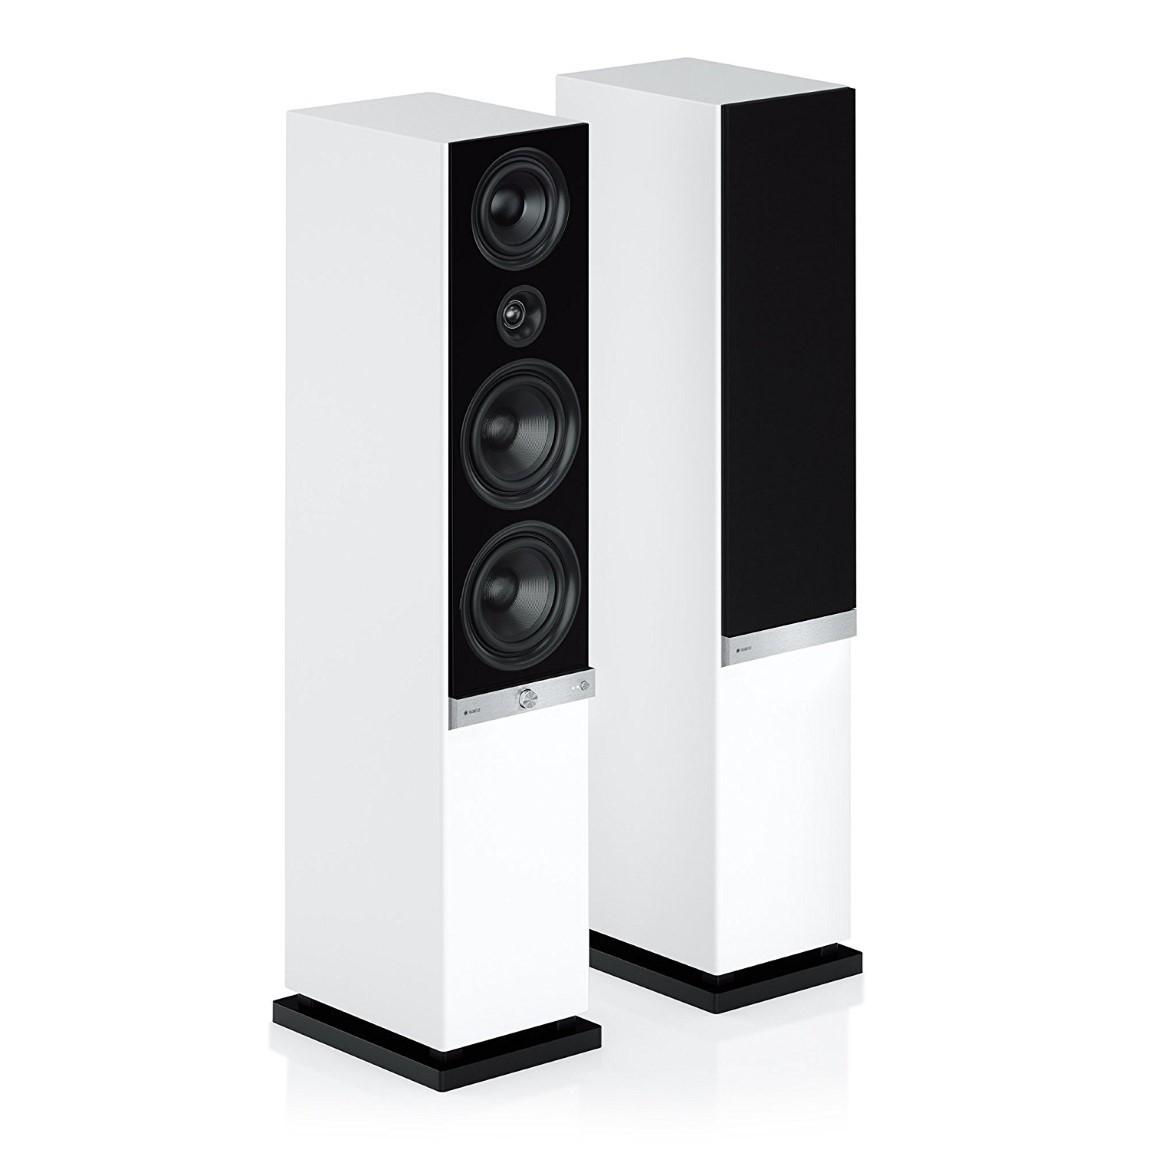 Teufel Raumfeld Stereo L WLAN-Lautsprecher - Weiß